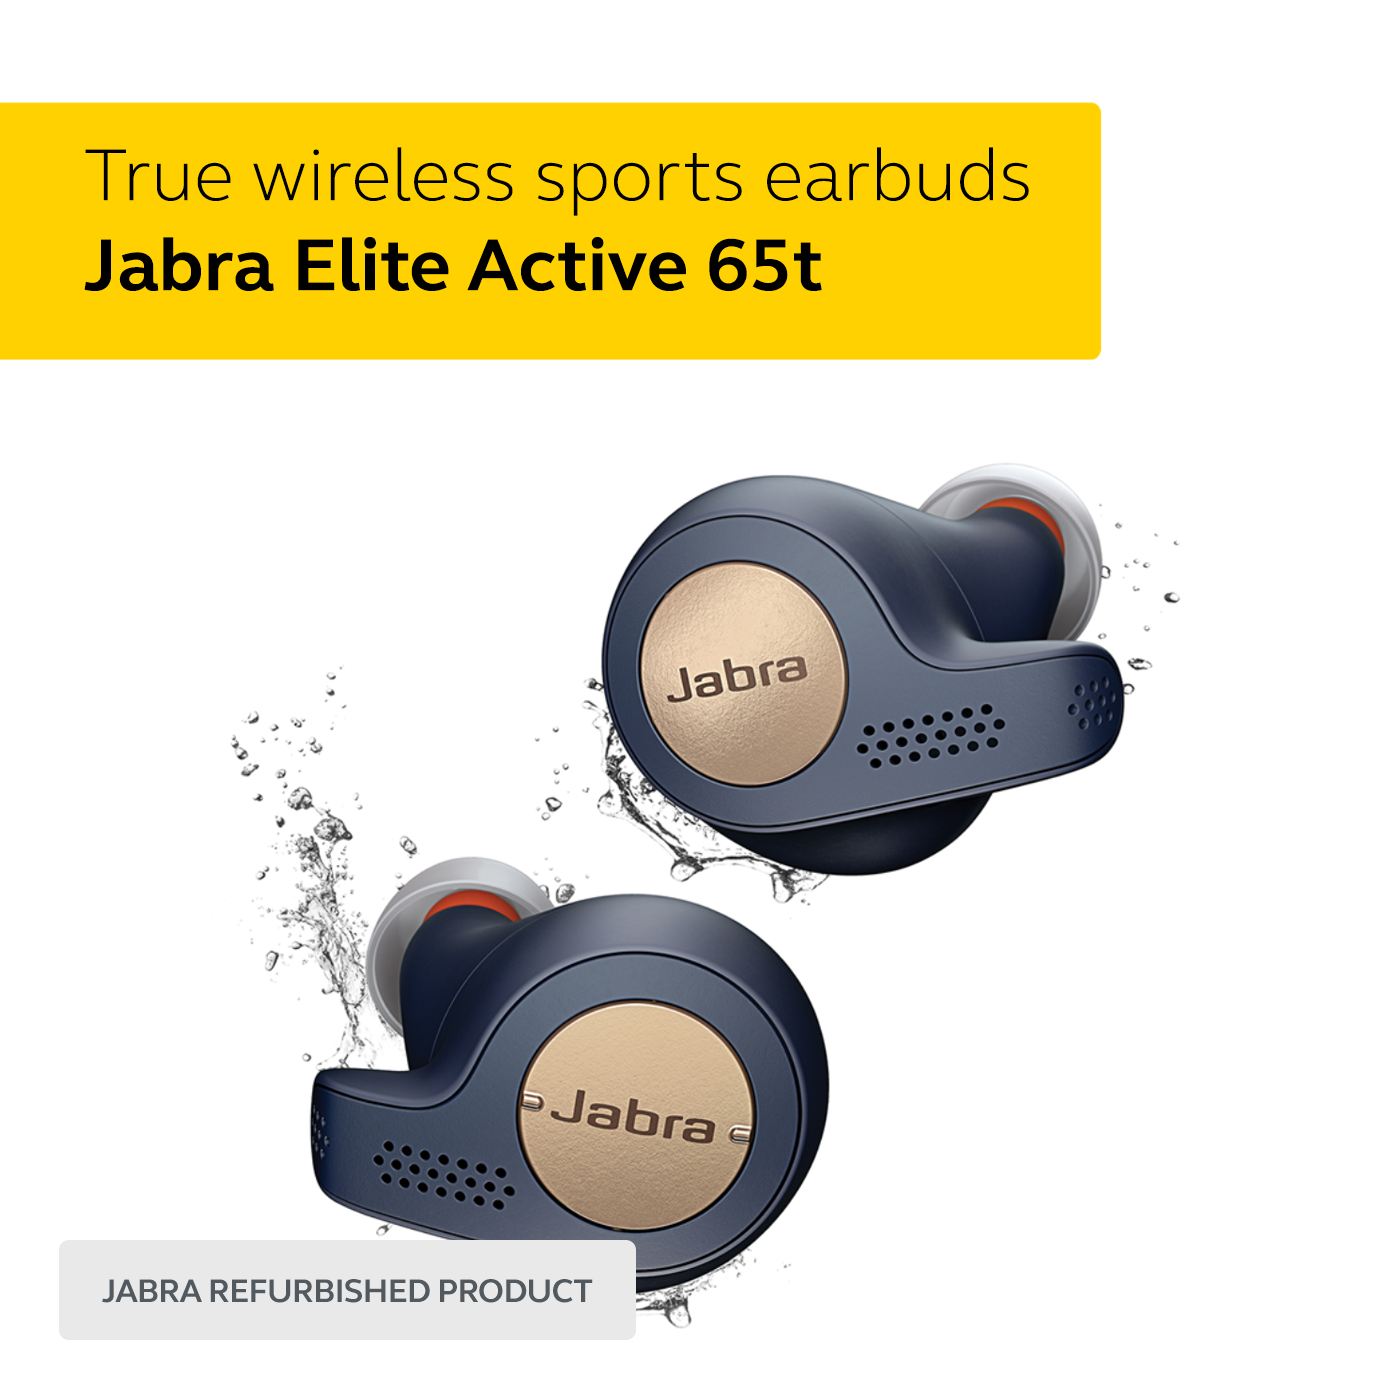 Jabra-Elite-Active-65t-True-Wireless-Earbuds-Manufacturer-Refurbished thumbnail 16